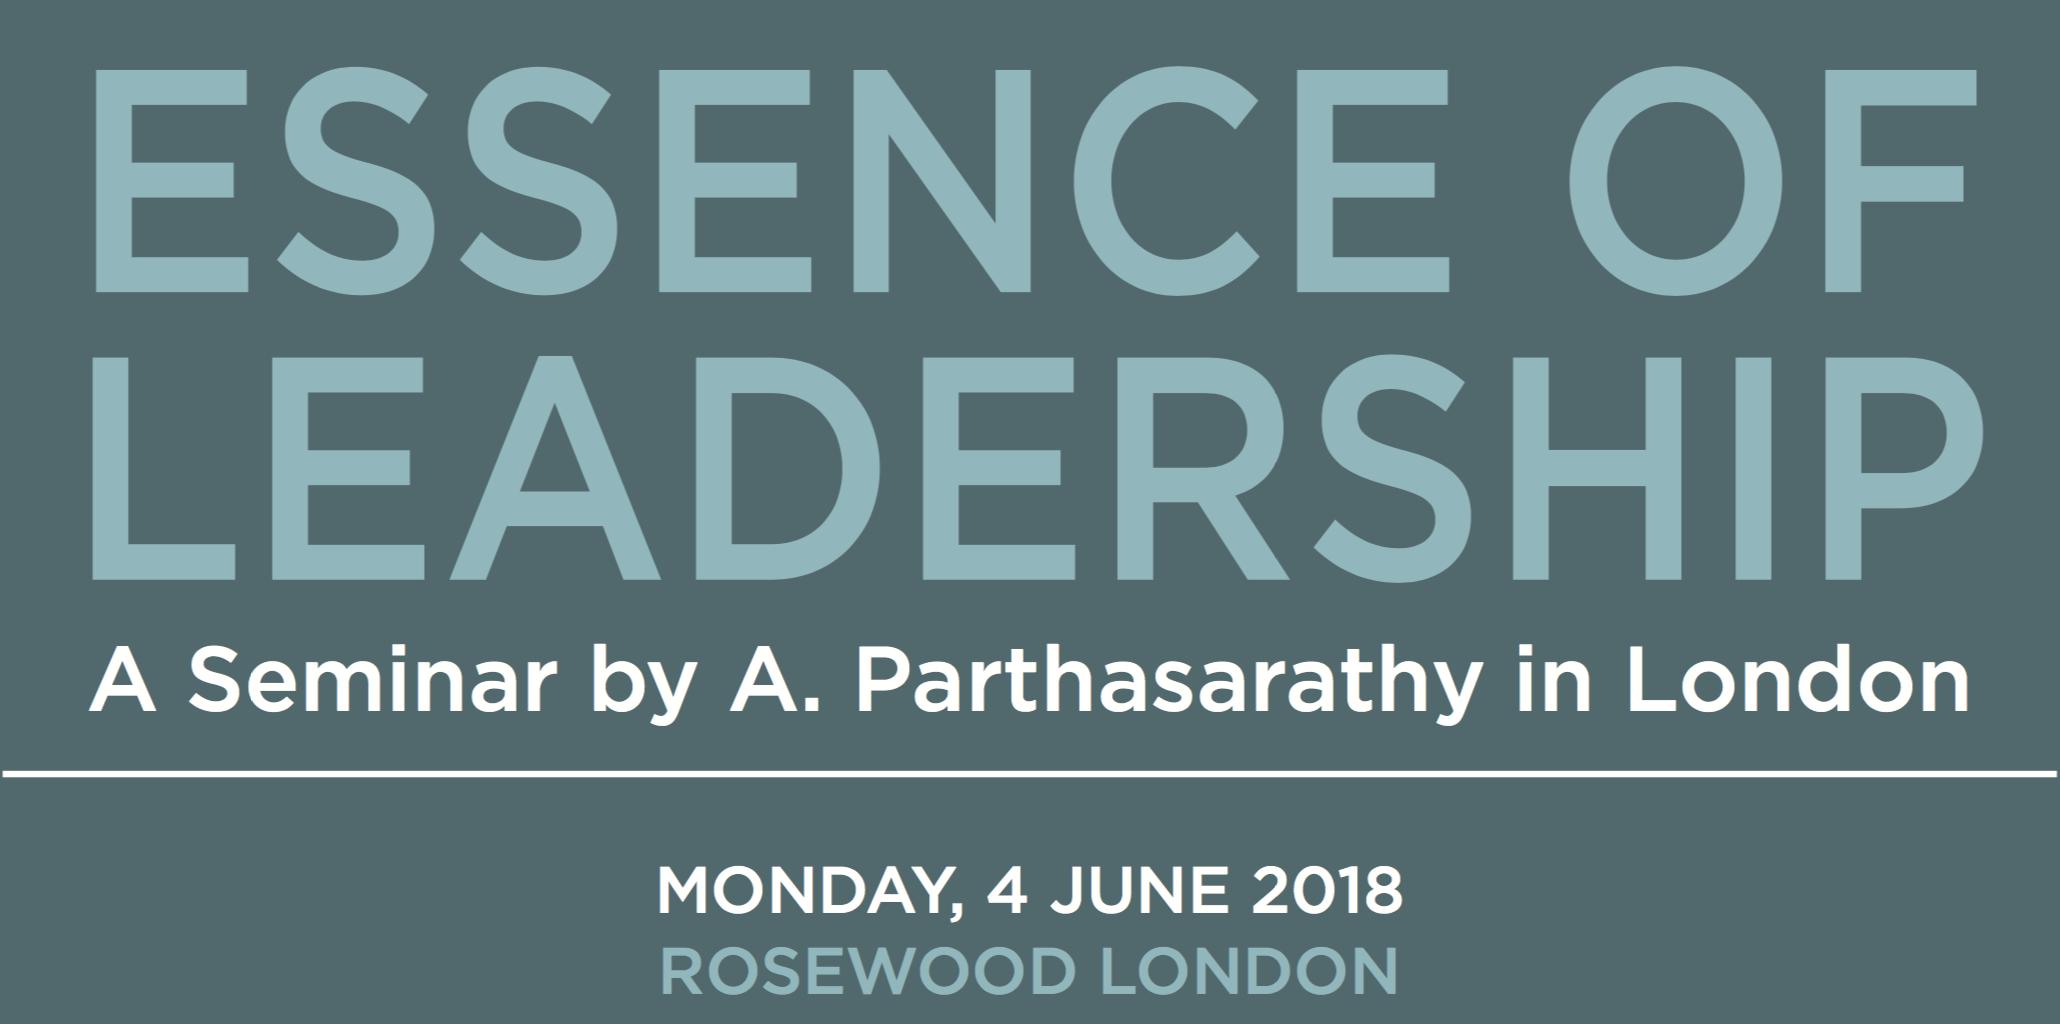 Copy of JUNE 4: ESSENCE OF LEADERSHIP SEMINAR